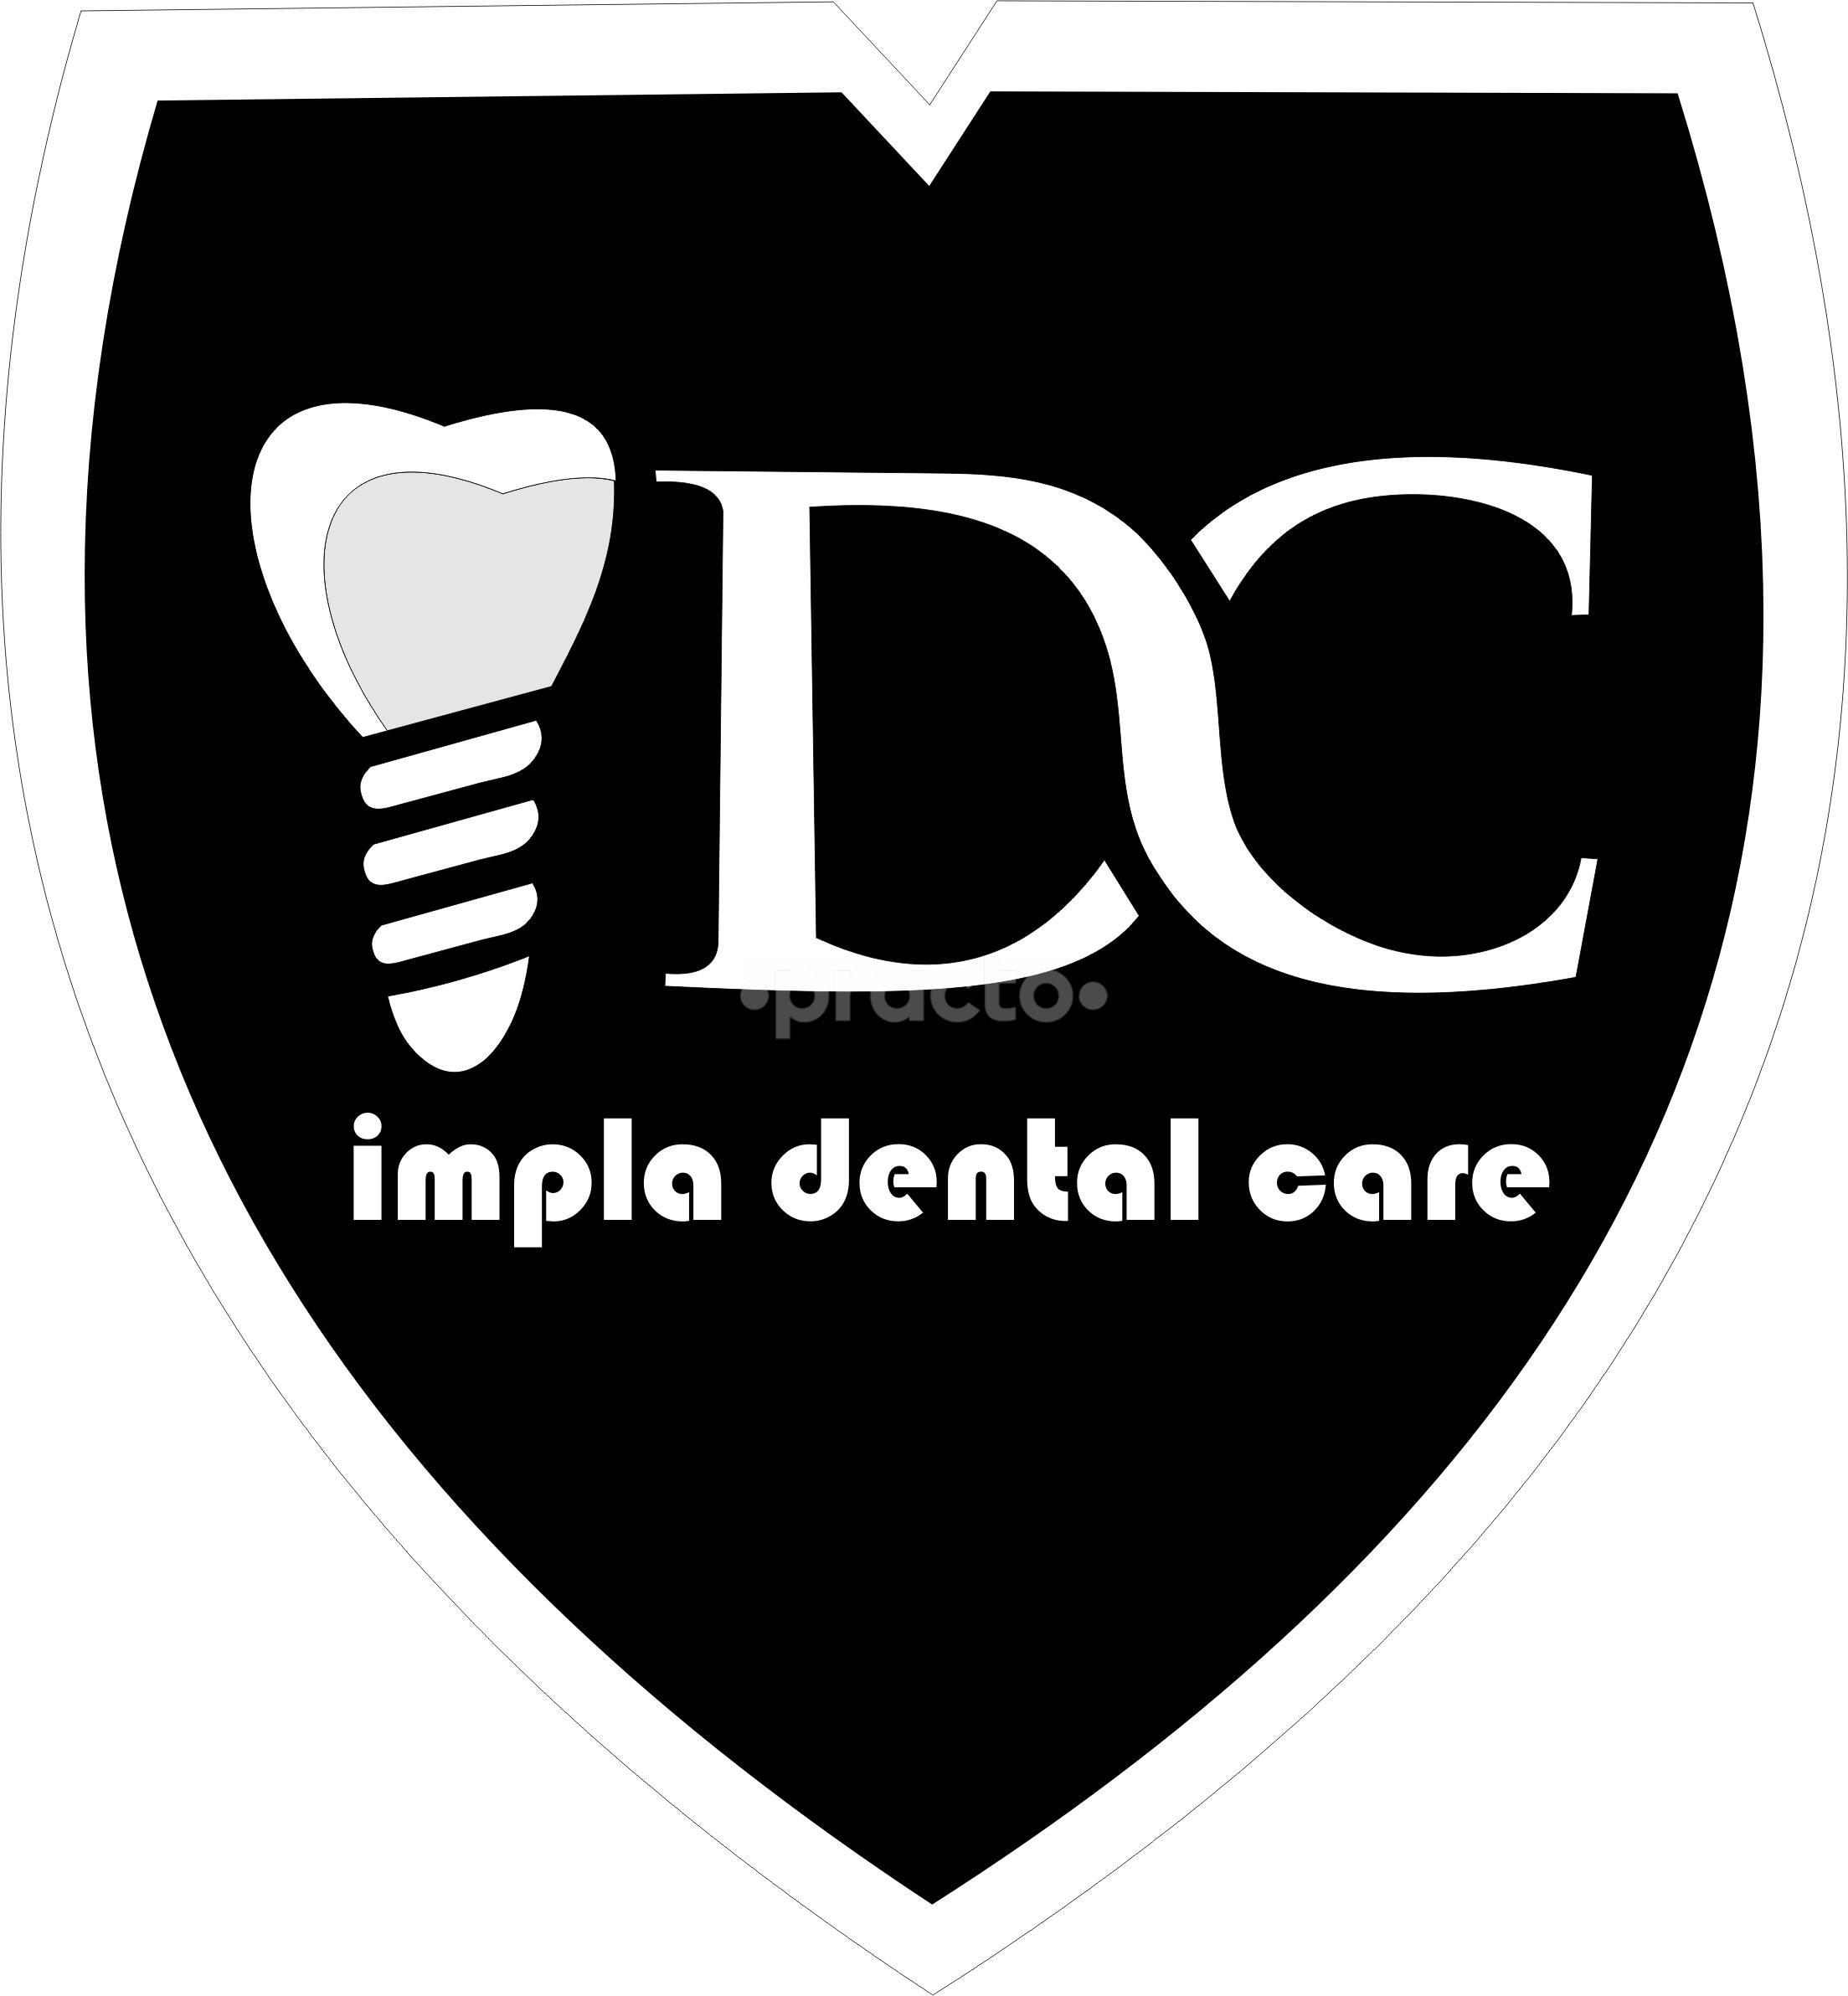 Impla Dental Care